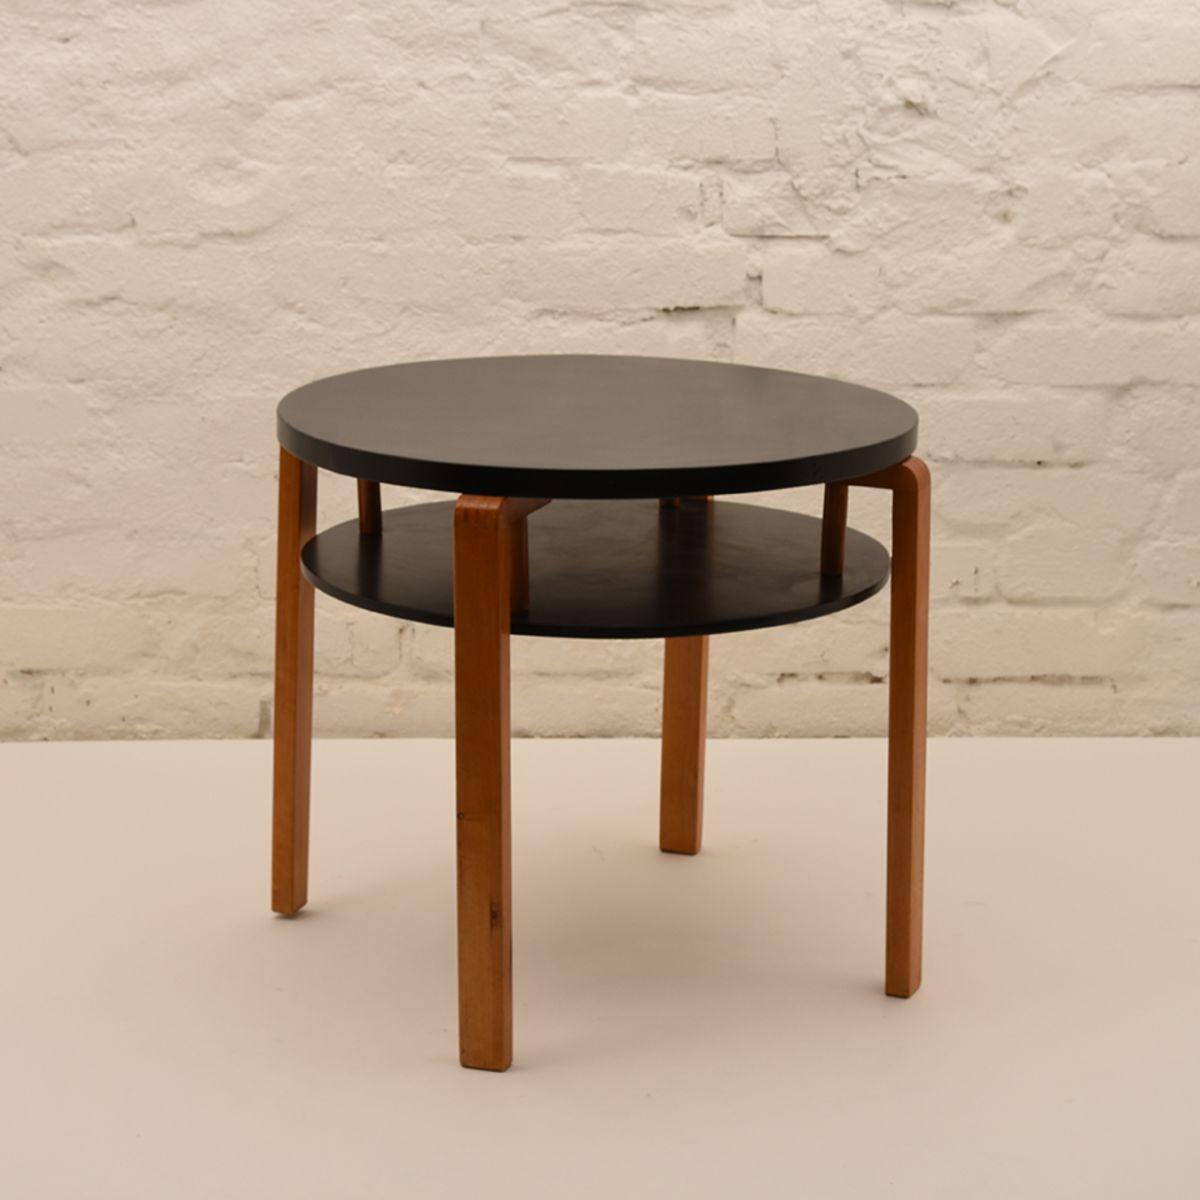 Alvar-Aalto_Club-Table